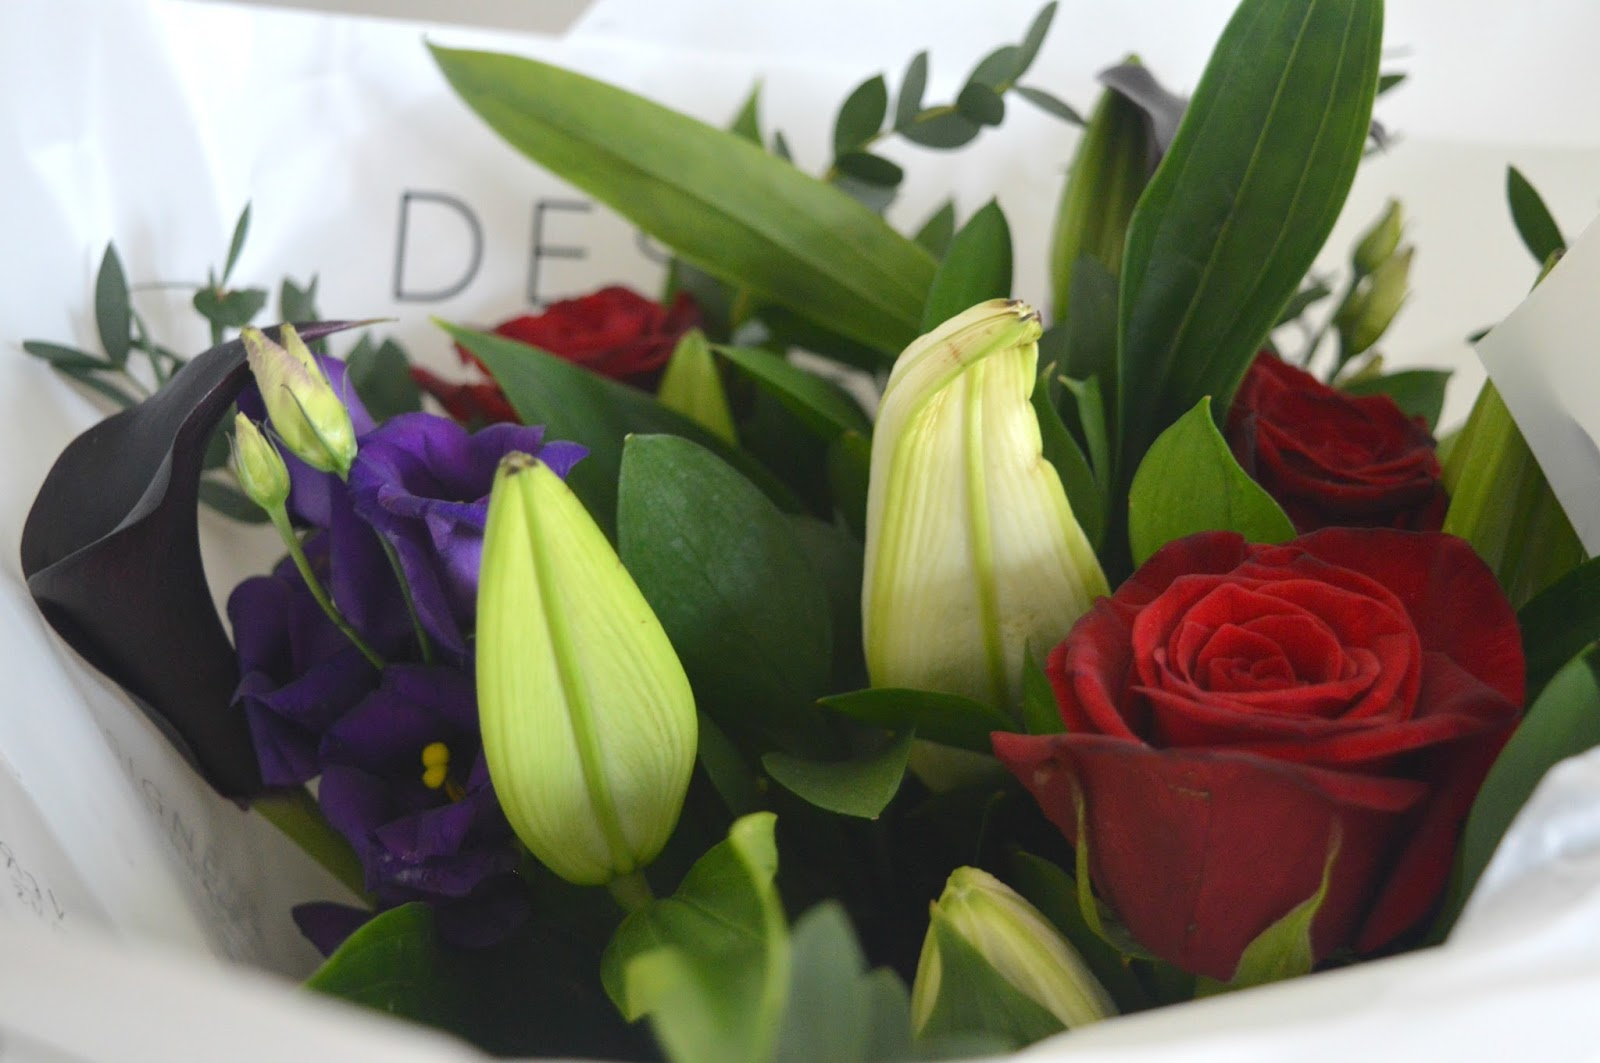 Happy valentines day with debenhams flowers new girl in toon izmirmasajfo